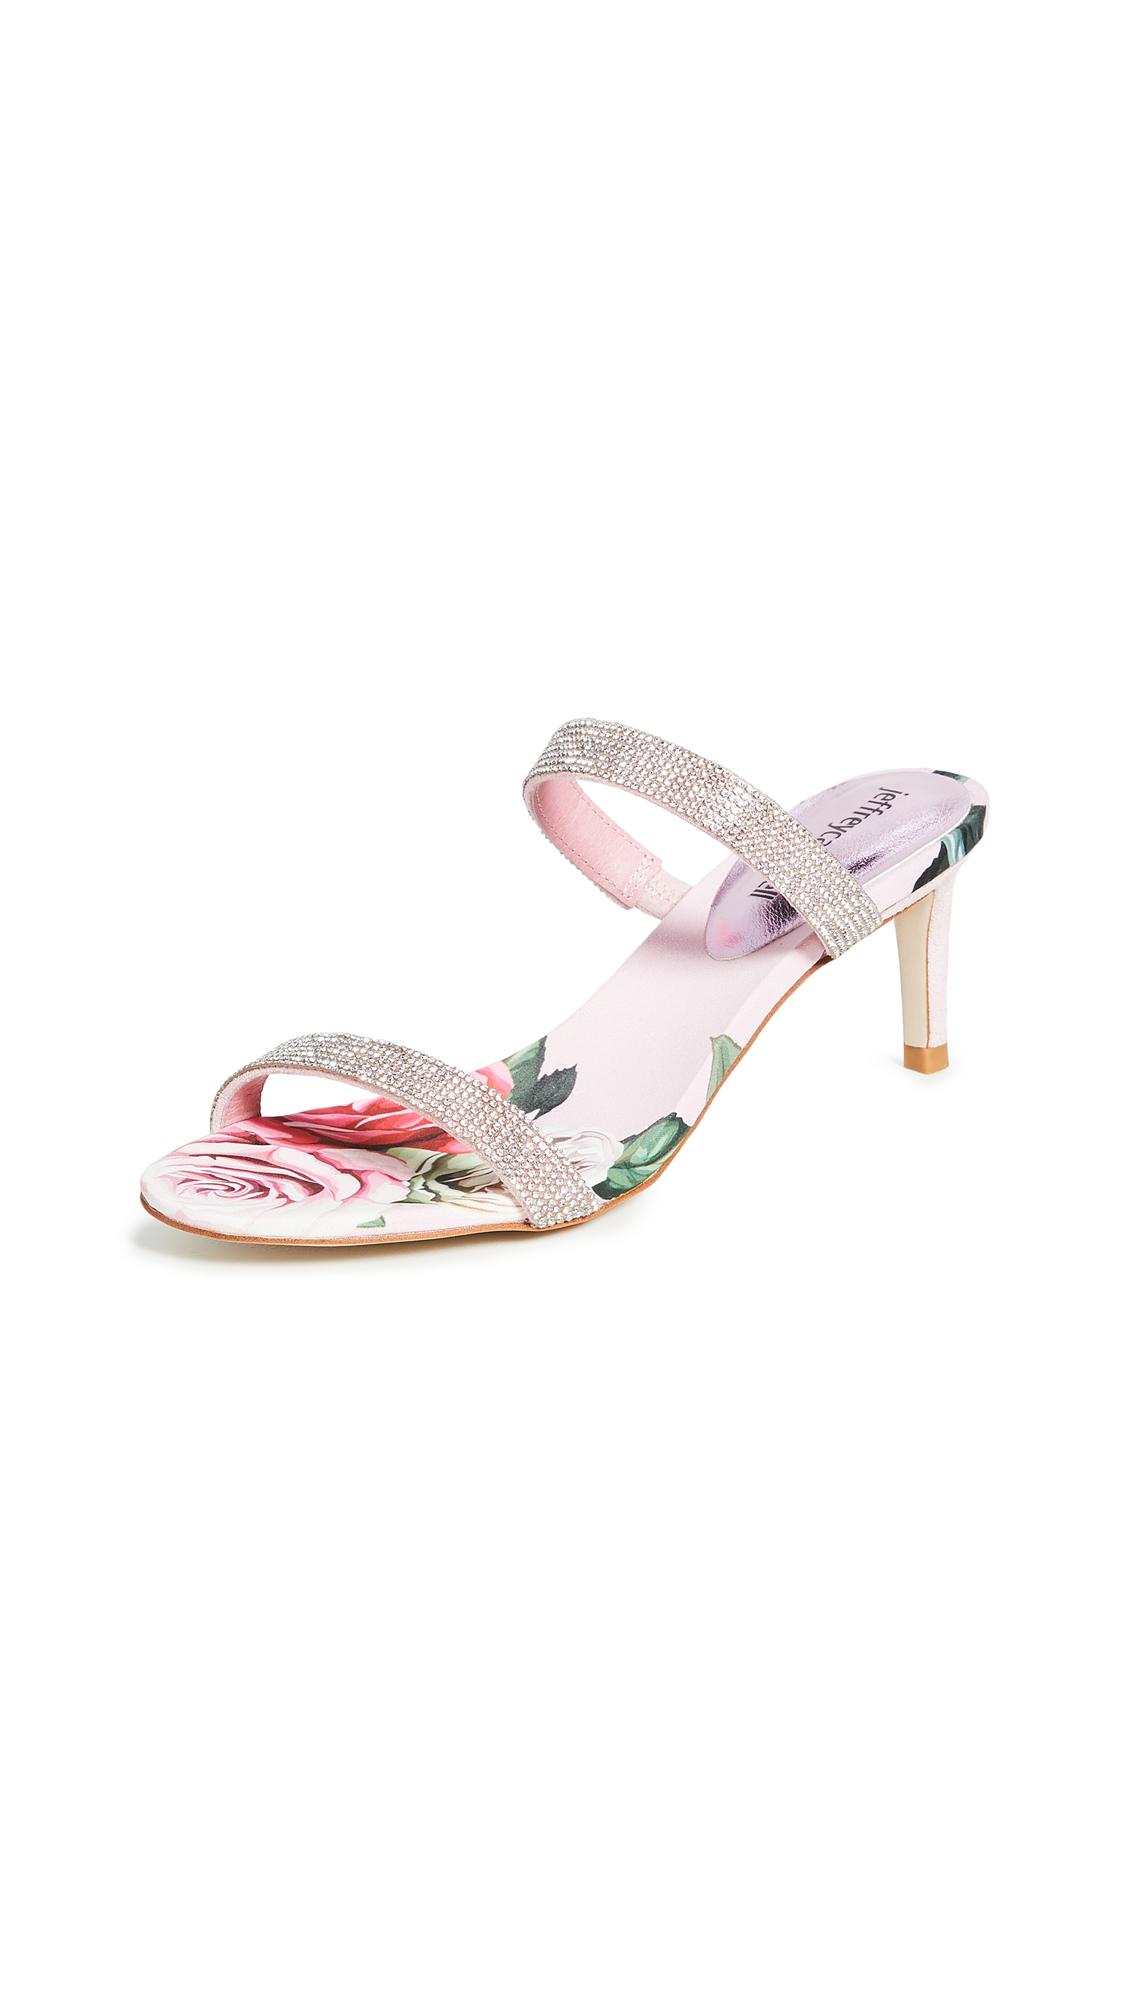 Buy Jeffrey Campbell Royal Sandals online, shop Jeffrey Campbell